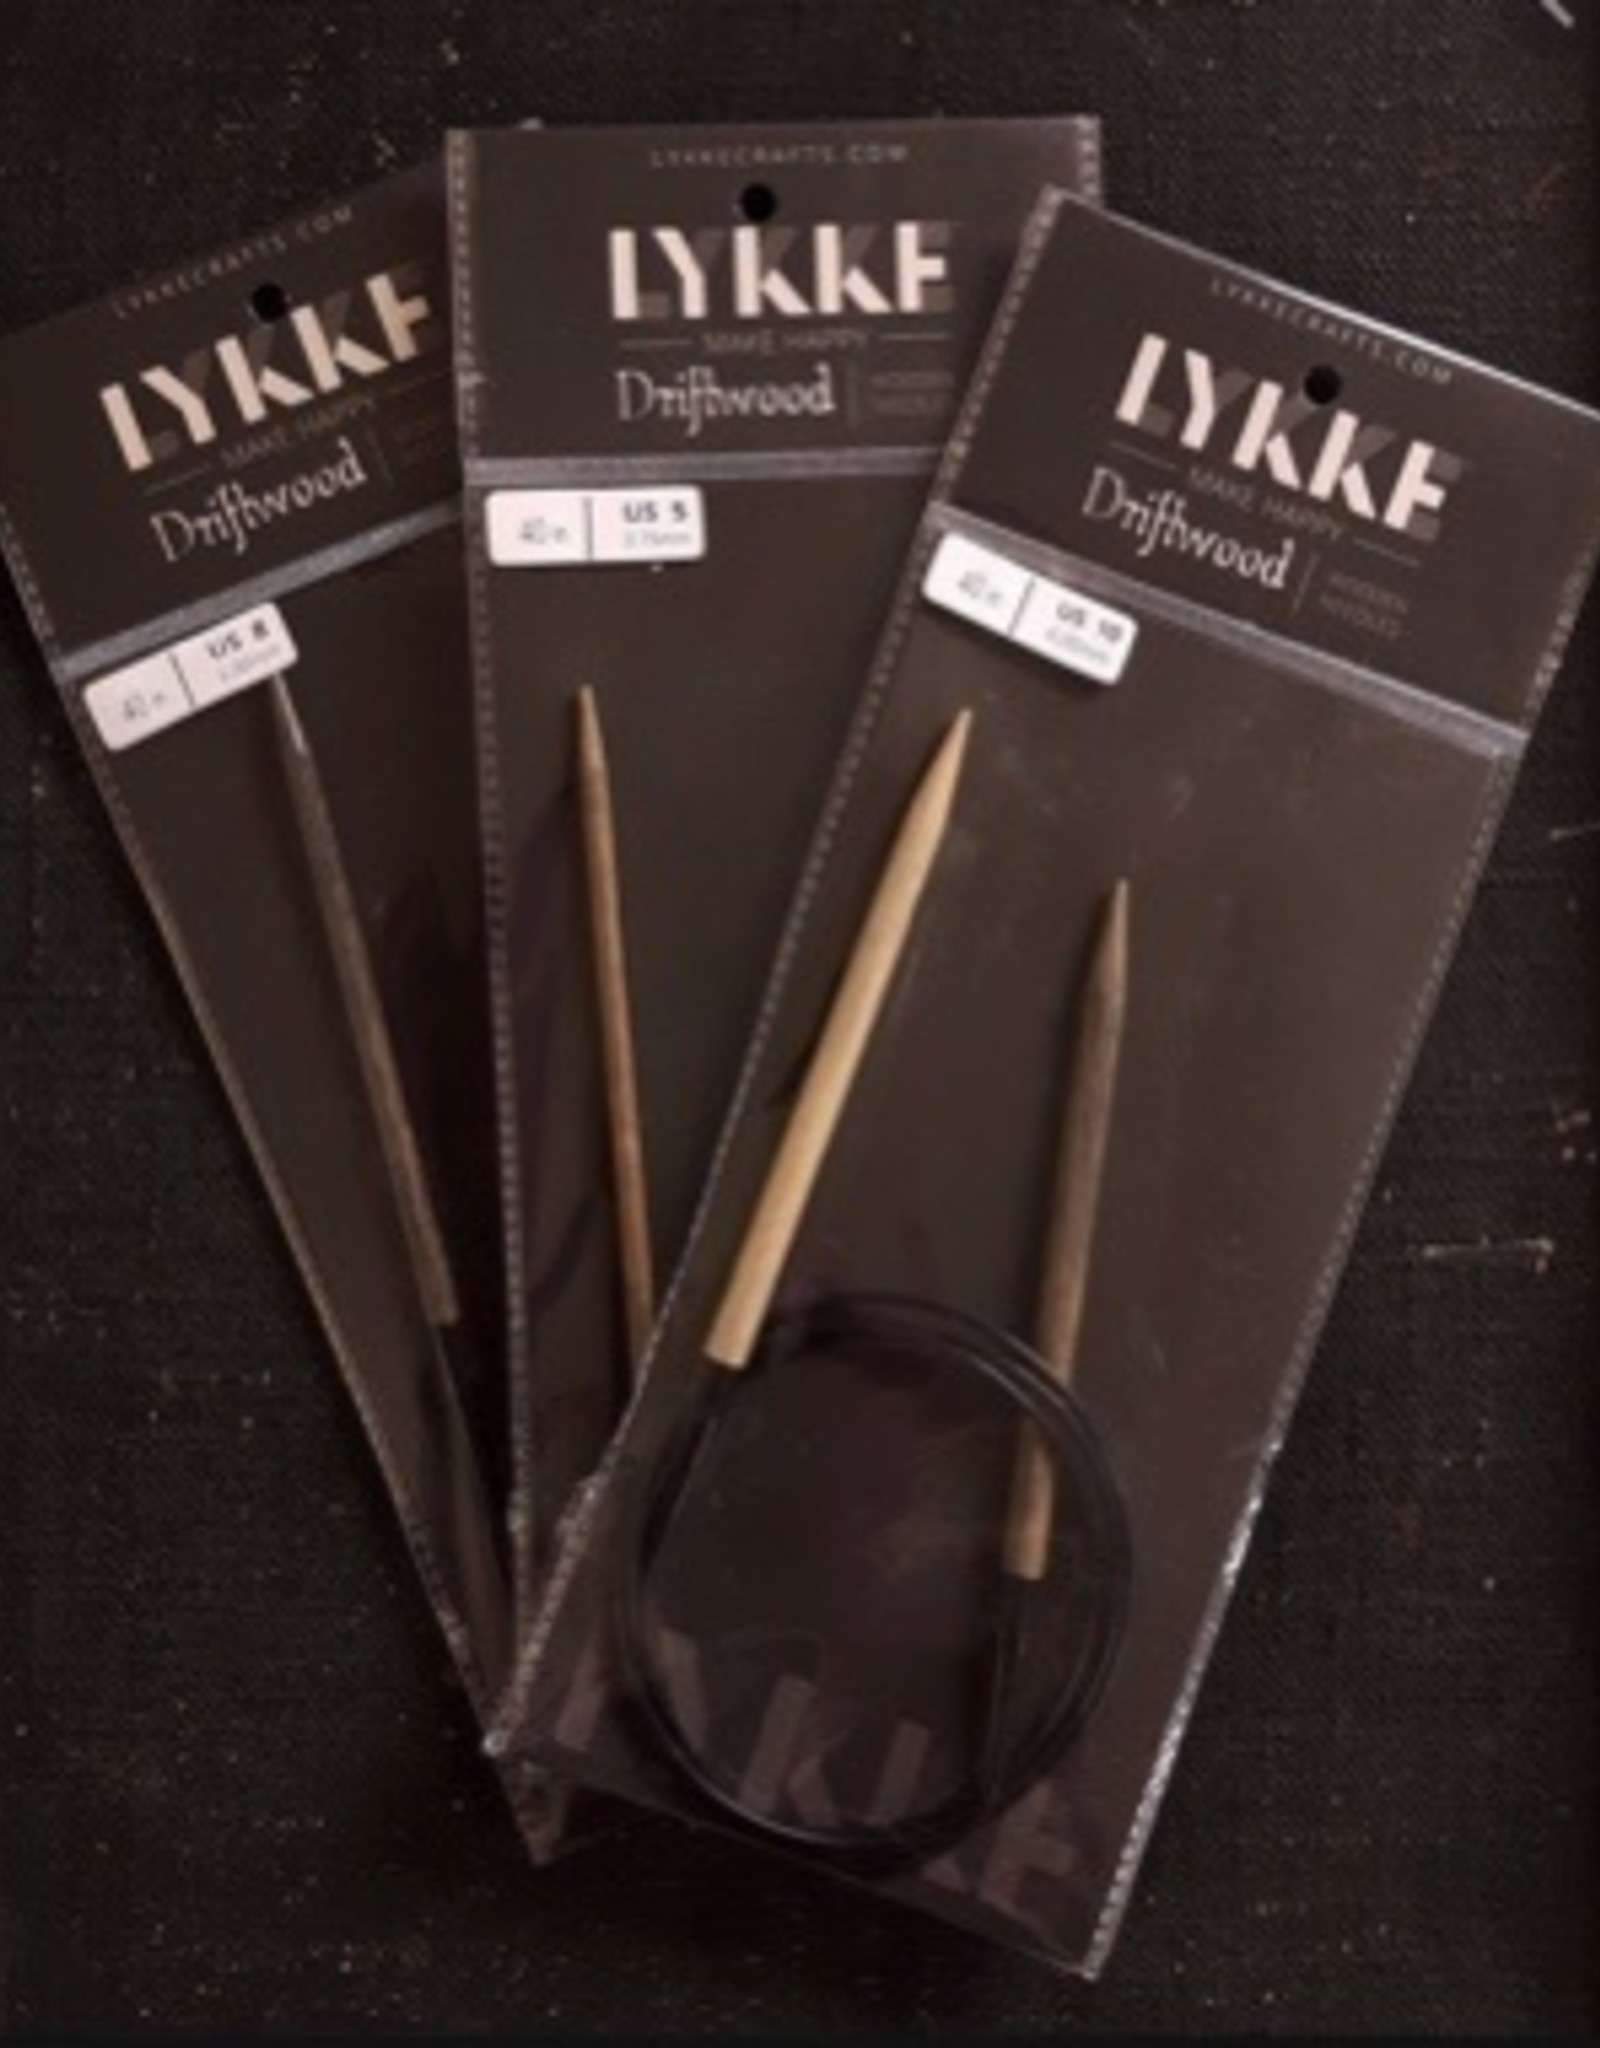 "Lykke Lykke Driftwood 24"" Circular Needles"